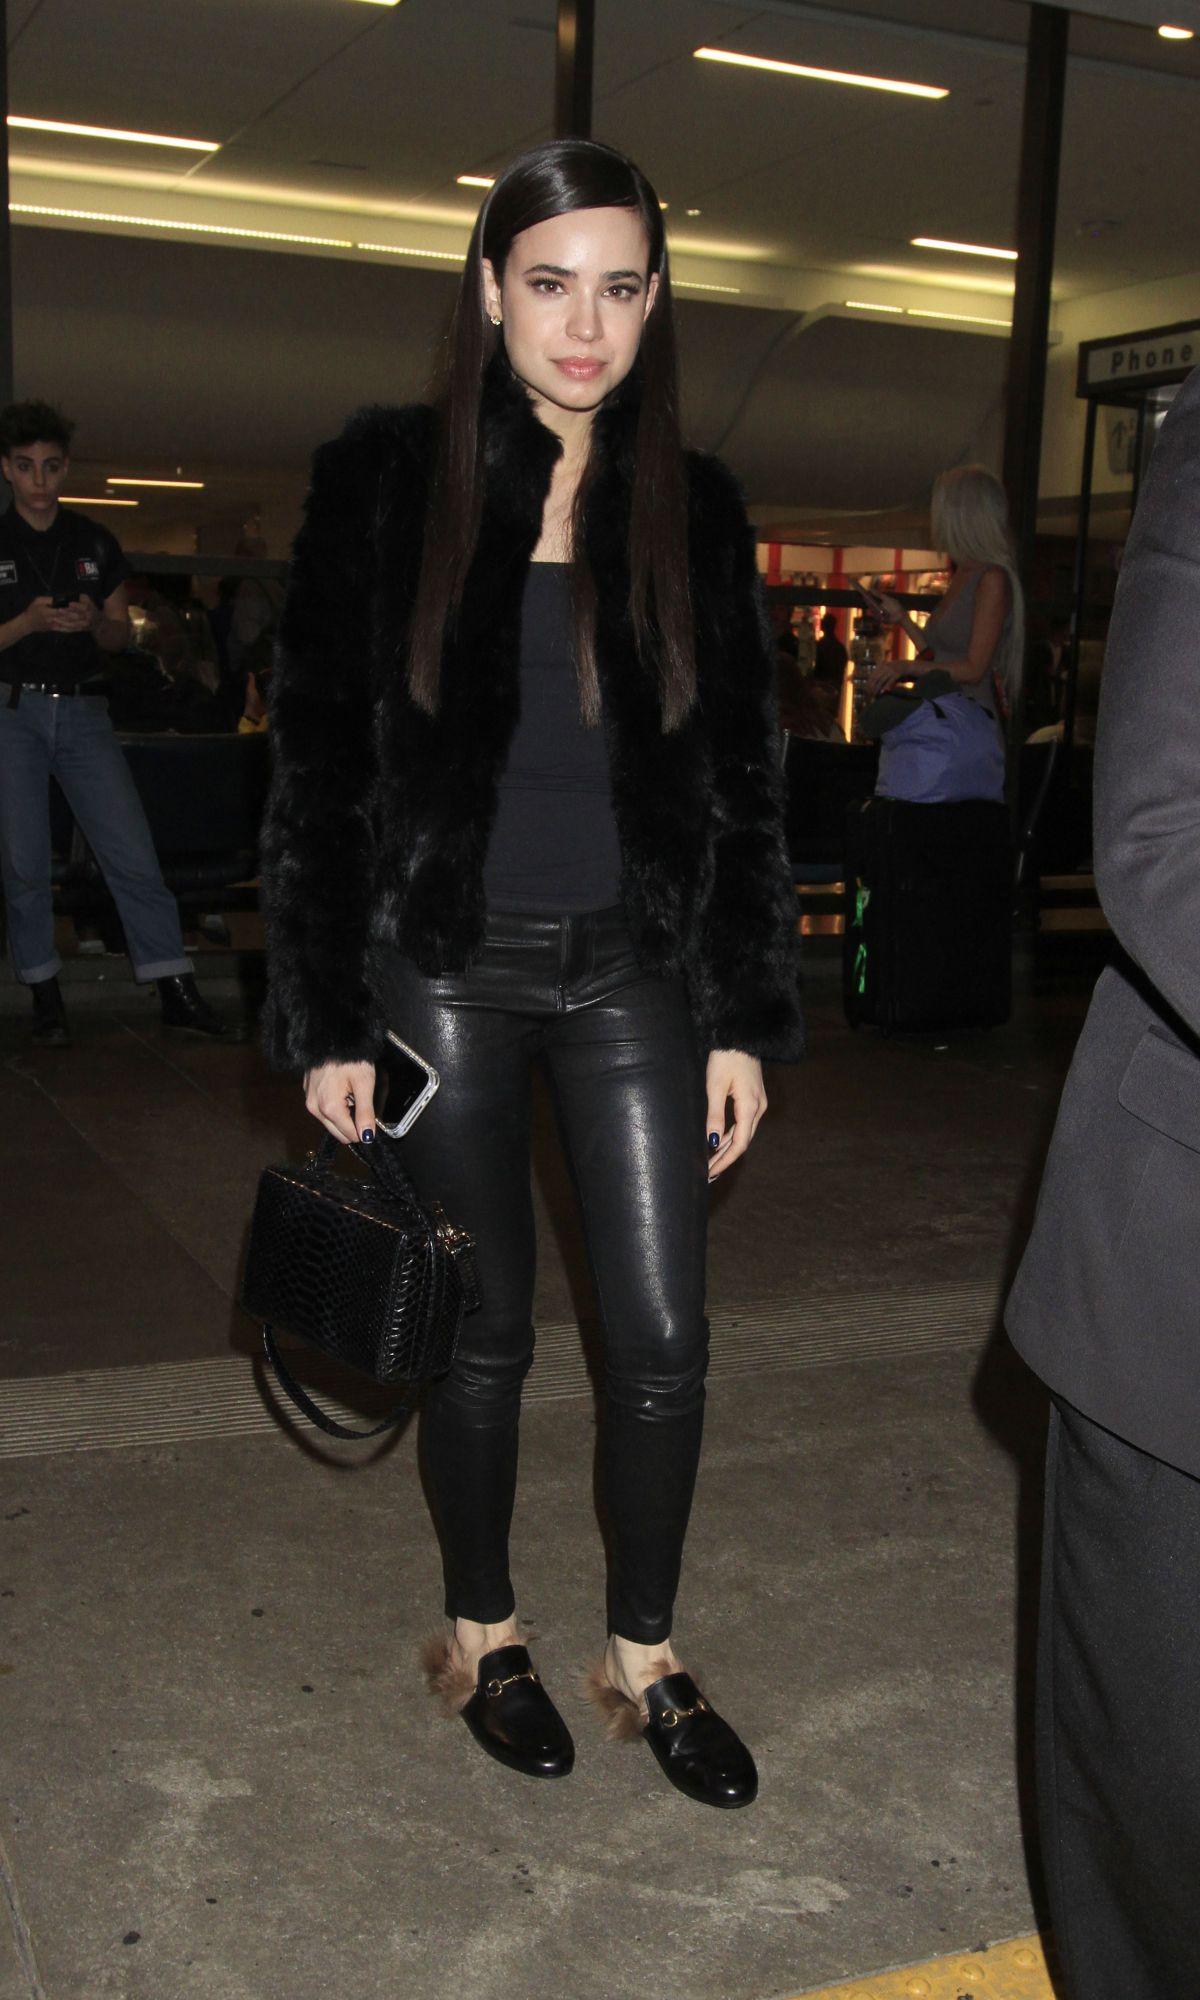 SOFIA CARSON at Los Angeles International Airport 04/12/2017